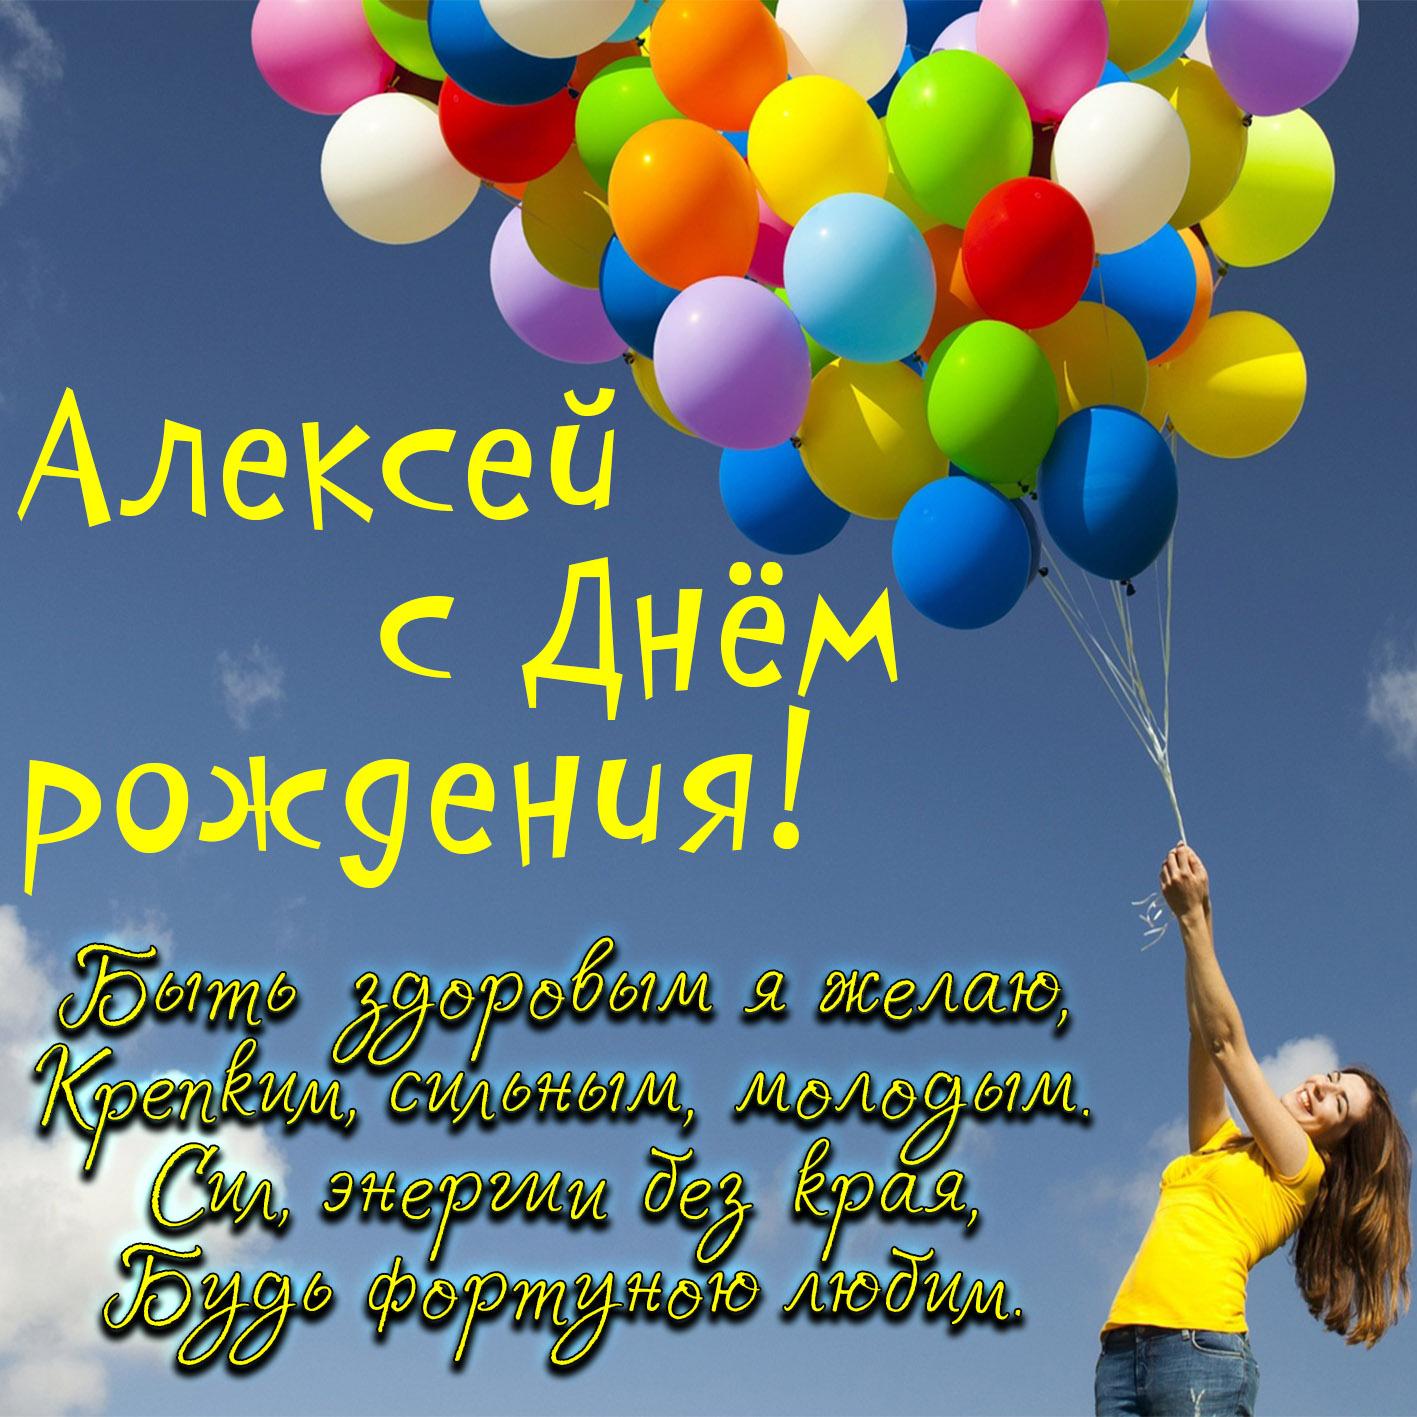 aleksey0023.jpg